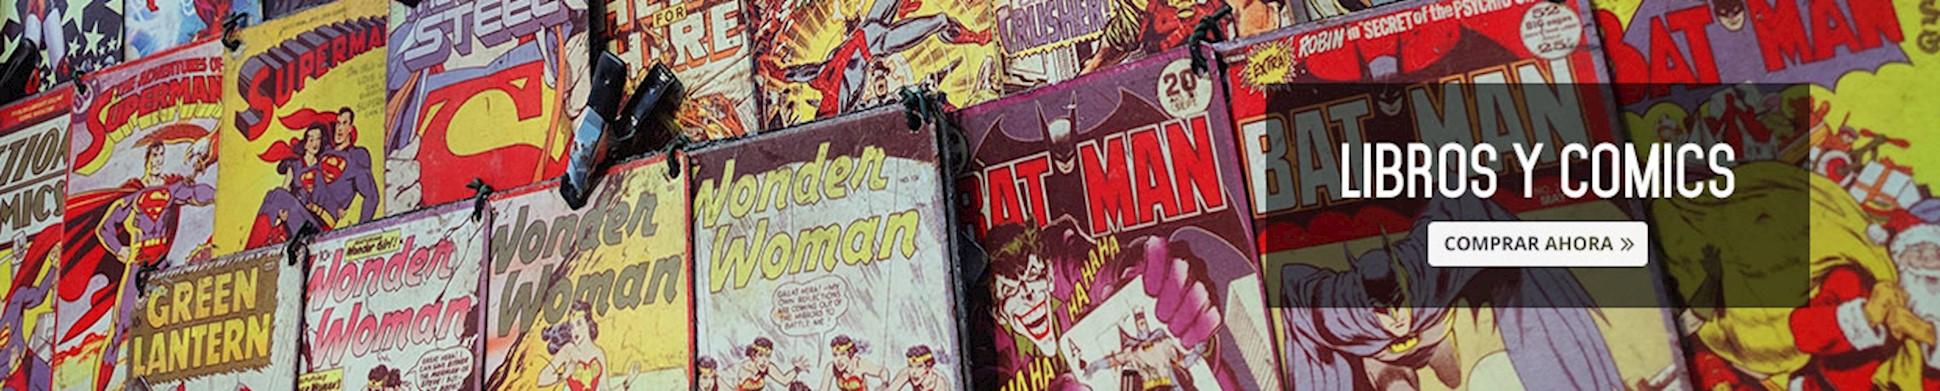 1240x250-libros-comics.jpg